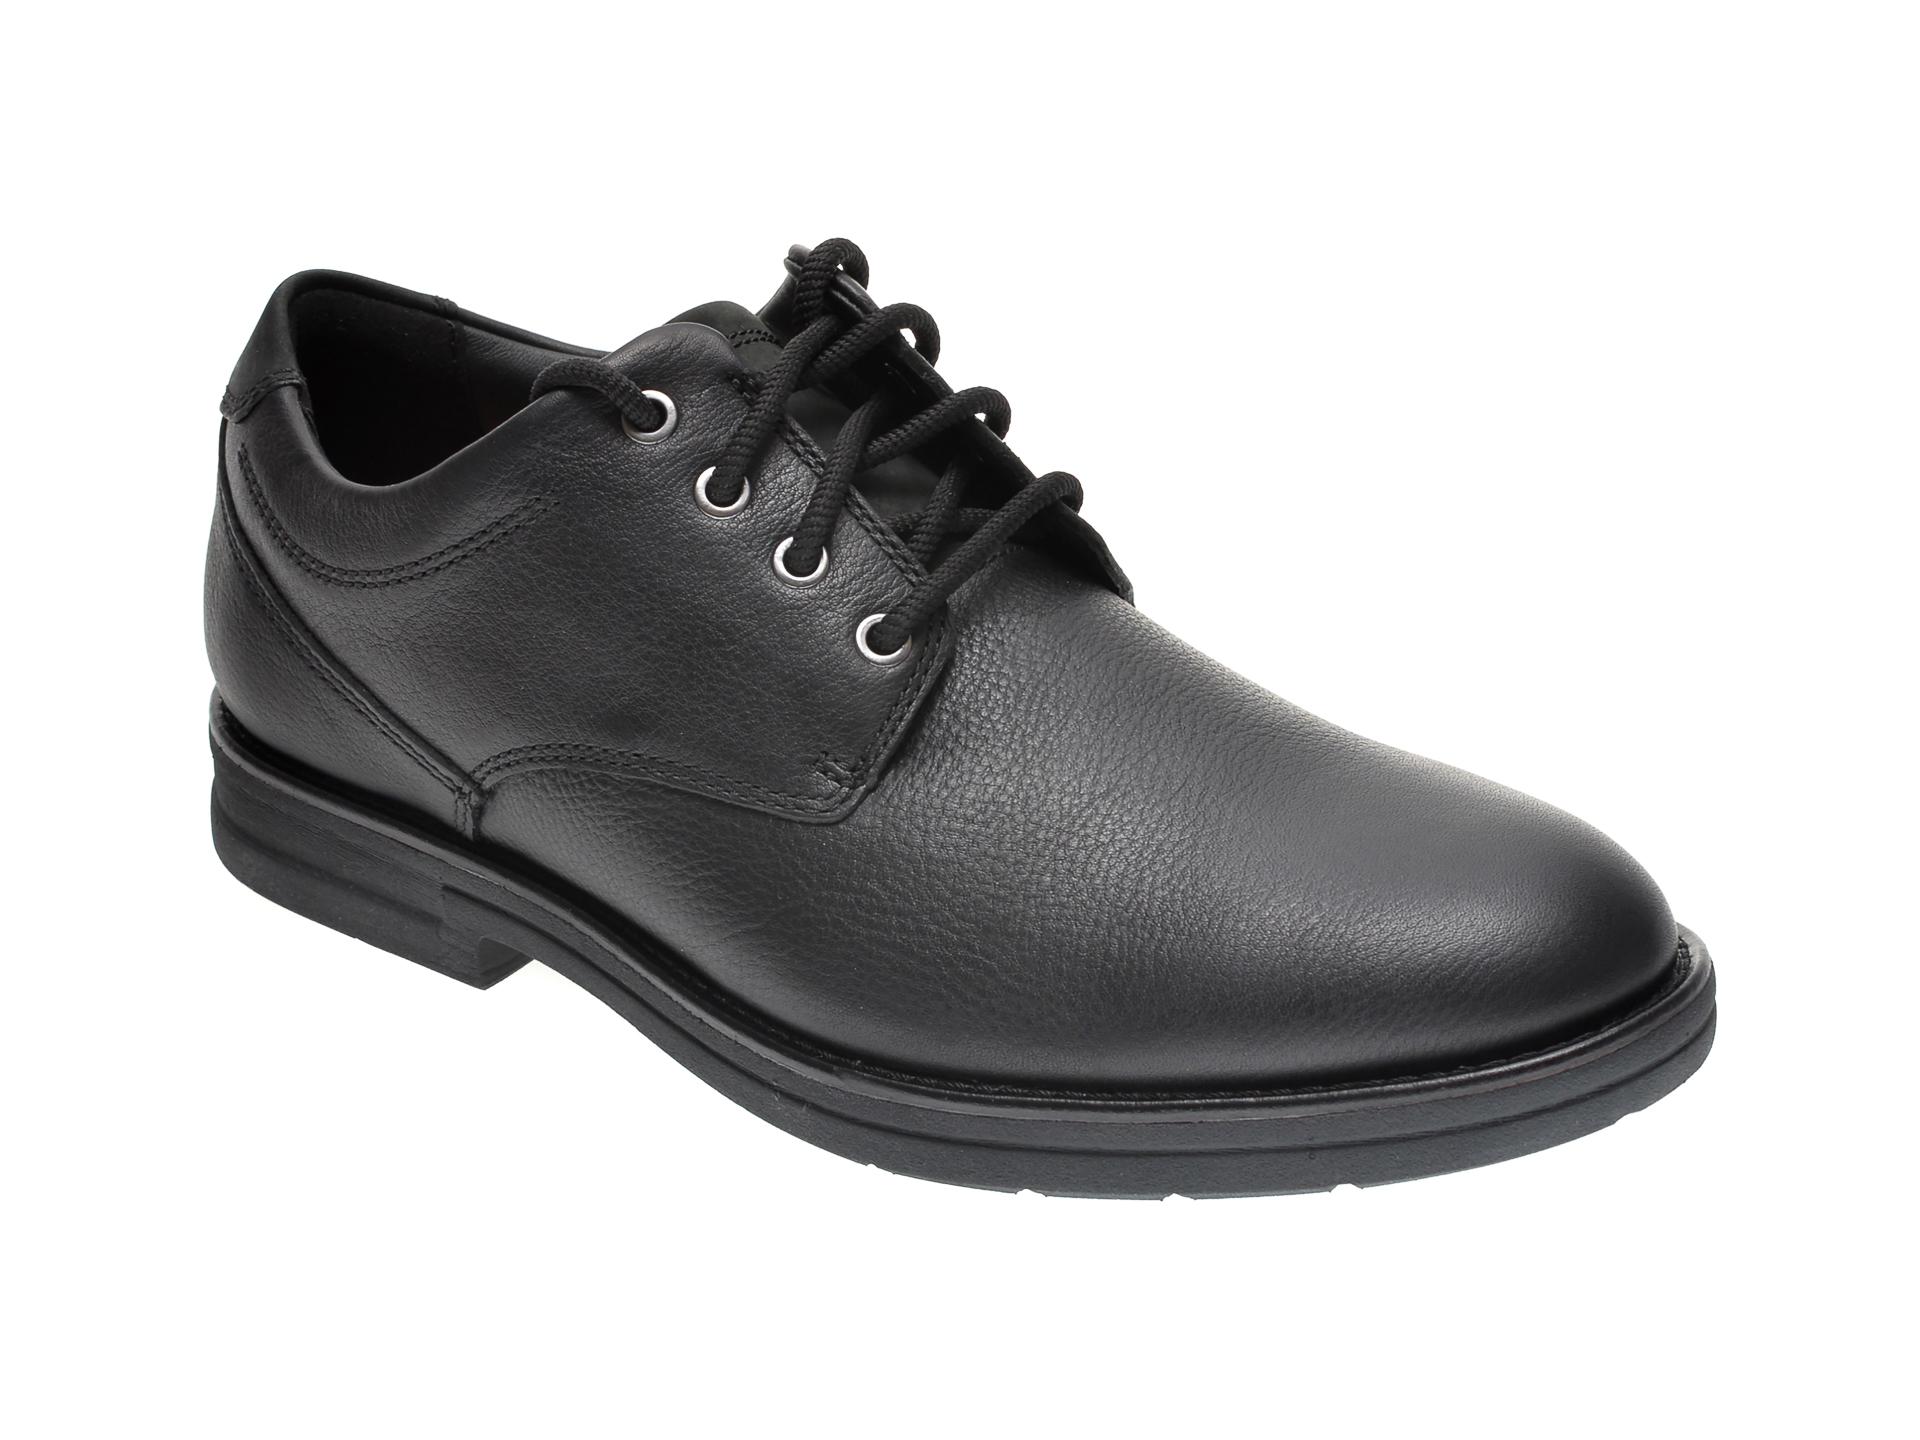 Pantofi CLARKS negri, BANNING PLAIN, din piele naturala imagine otter.ro